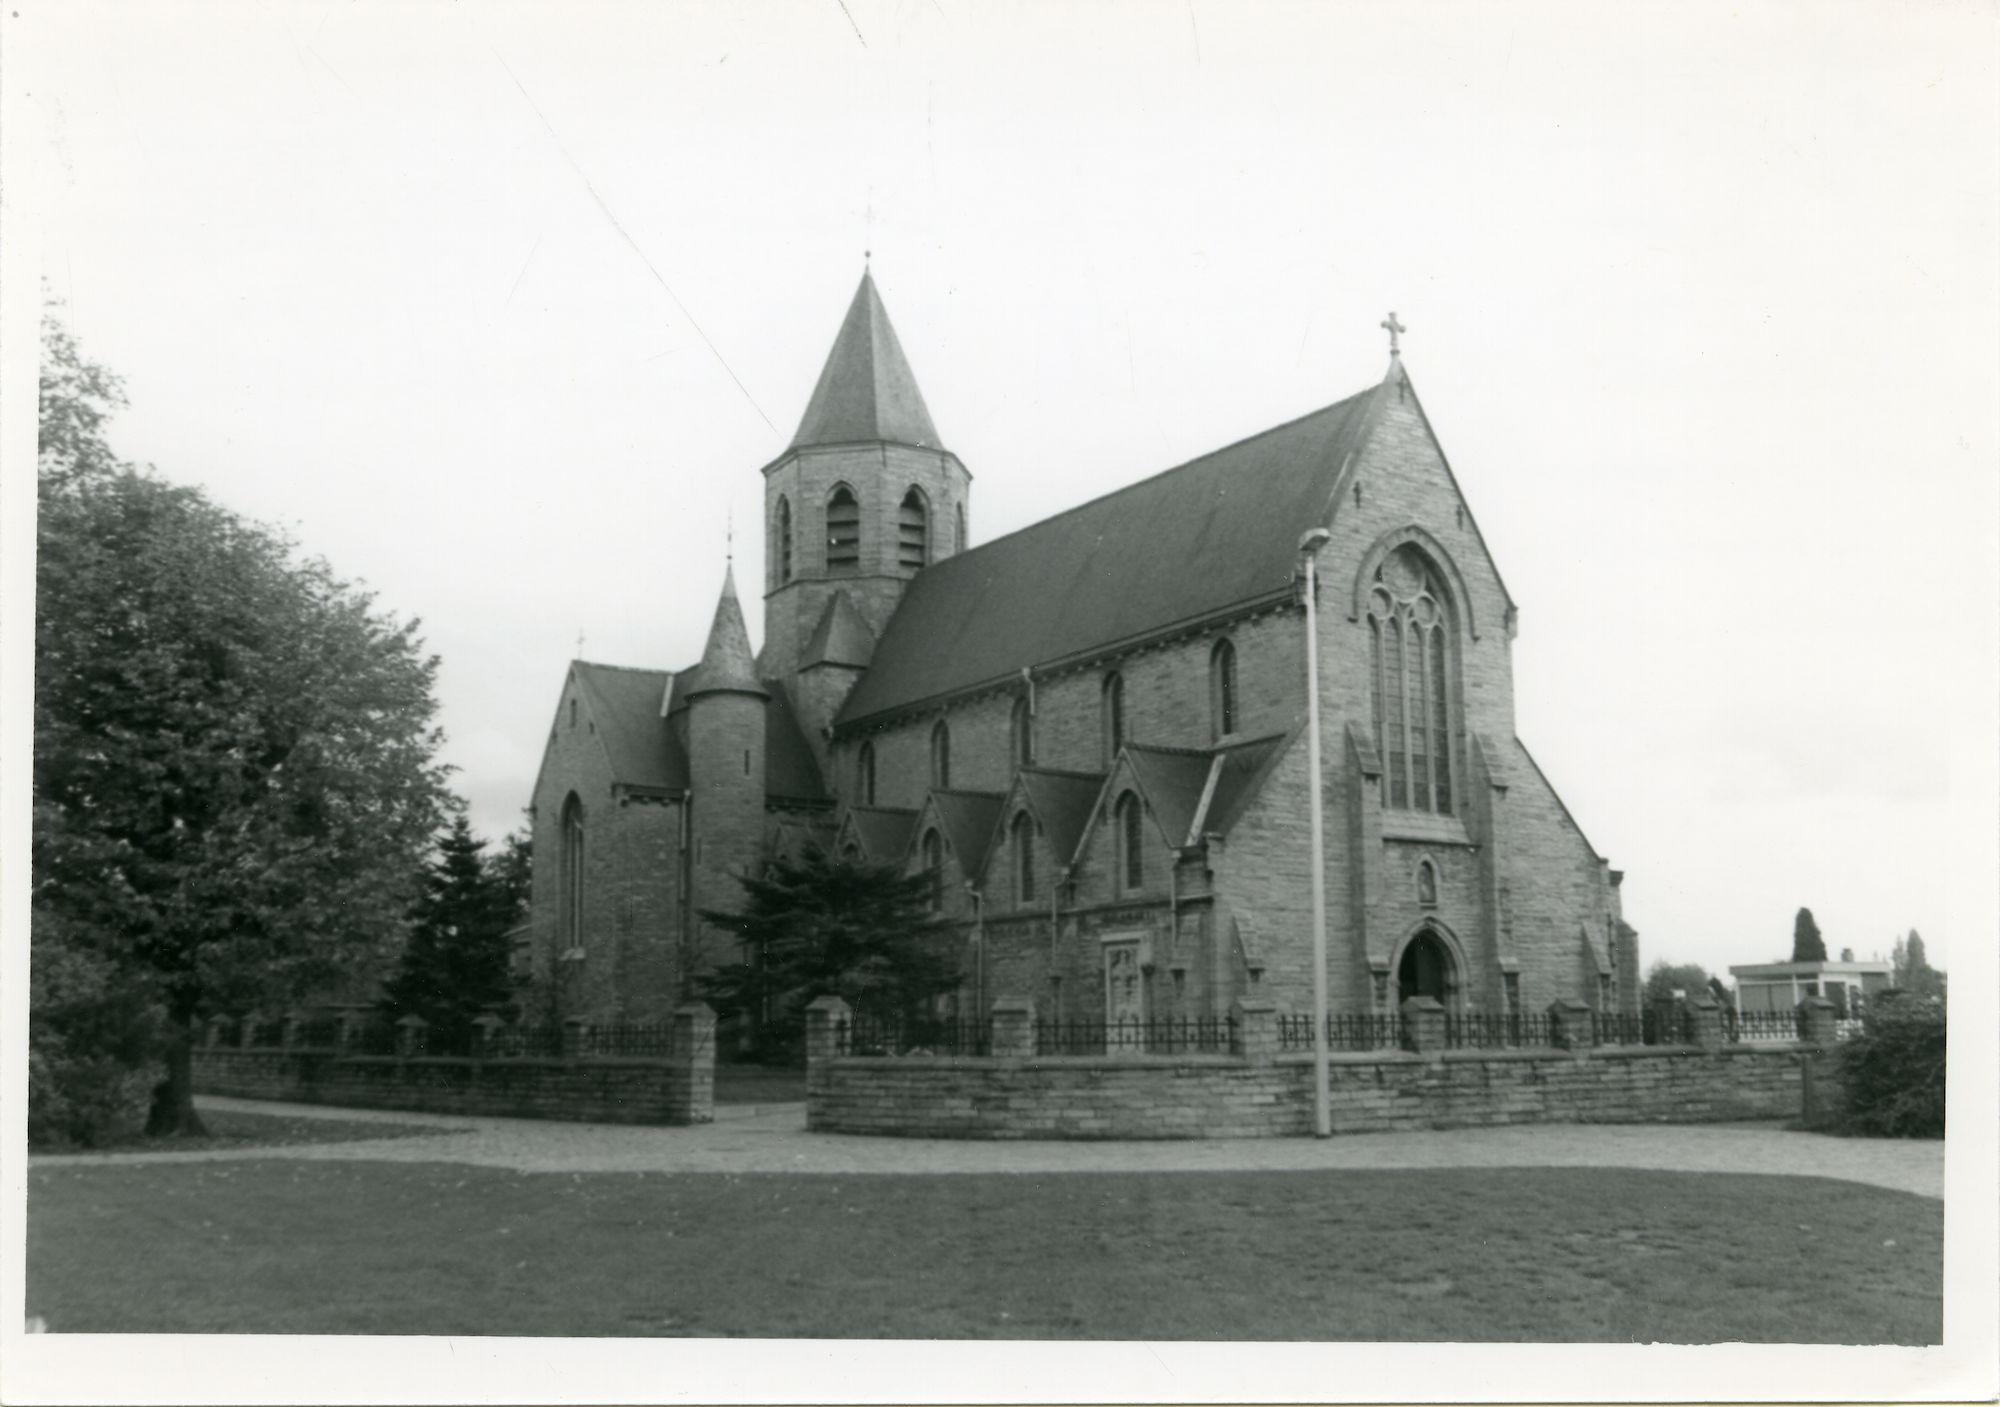 Mariakerke: Mariakerkeplein: Onze-Lieve-Vrouwkerk